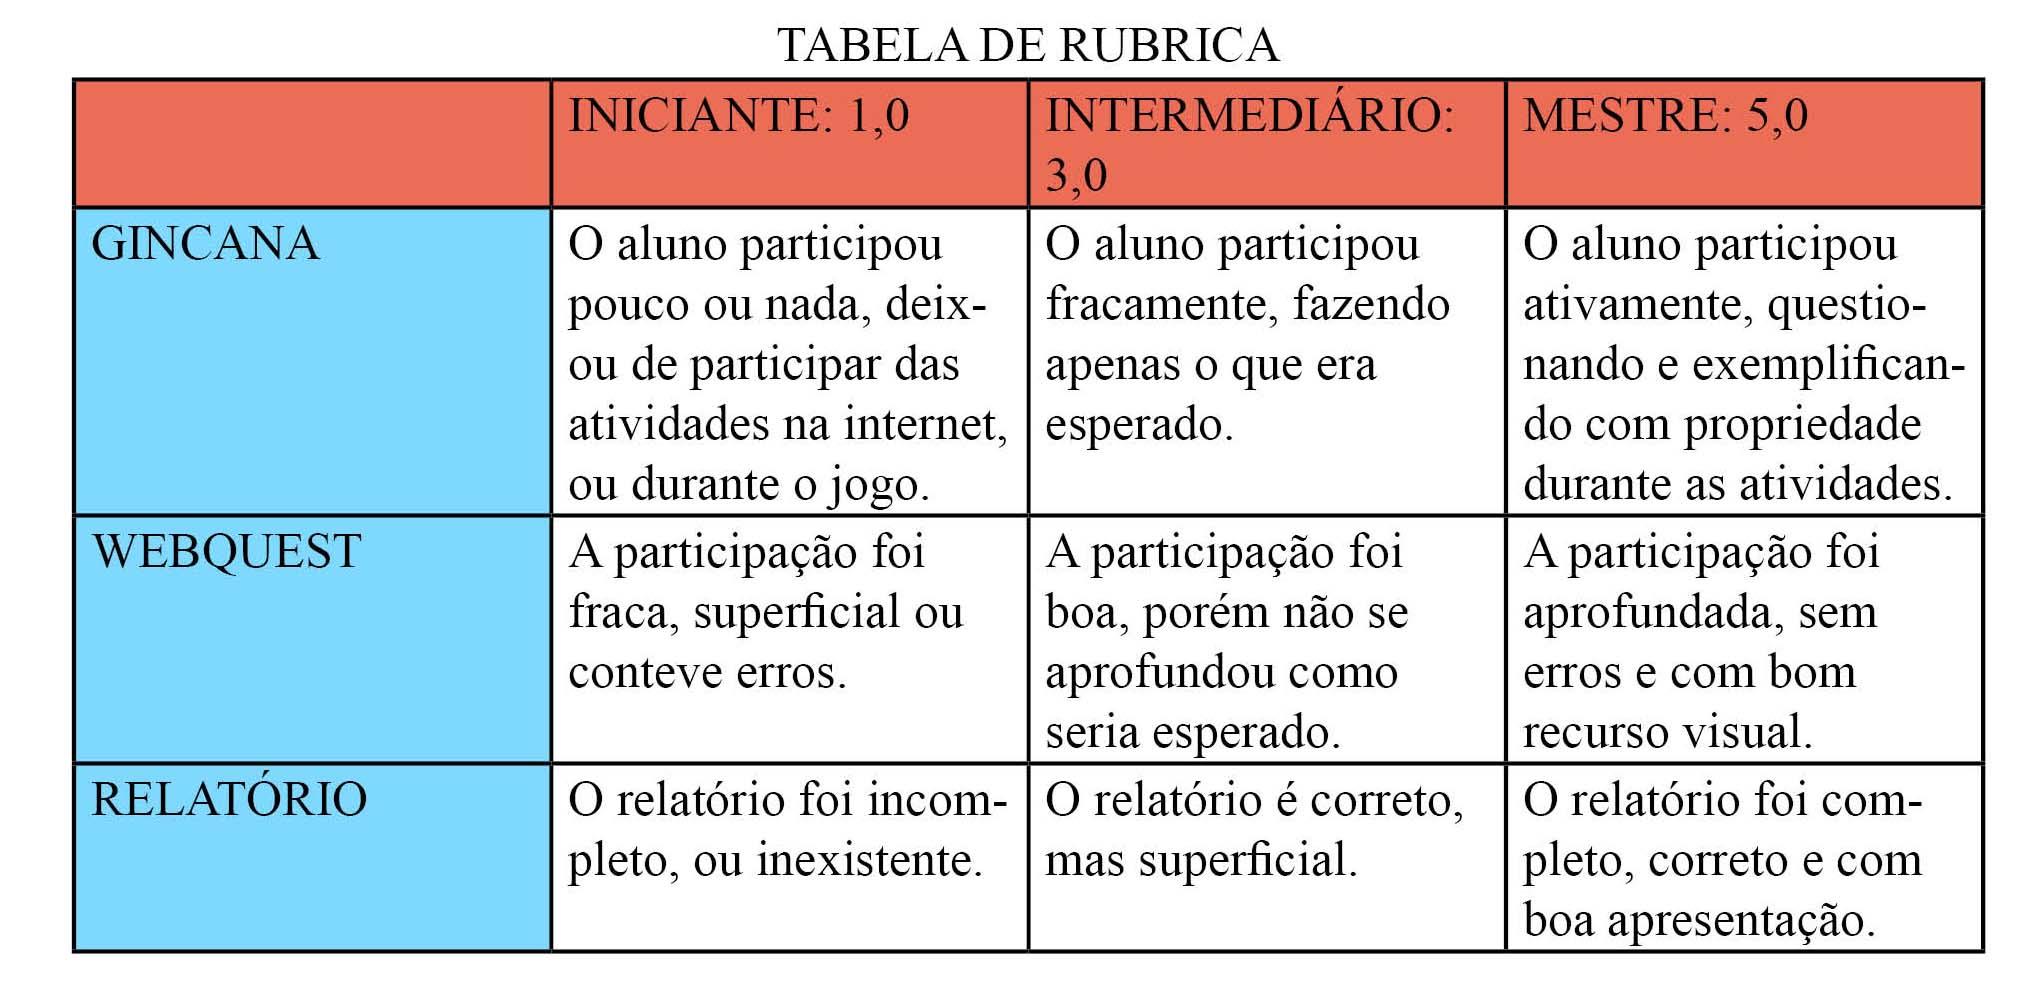 http://portaldoprofessor.mec.gov.br/storage/discovirtual/aulas/933/imagens/rubrica17.jpg